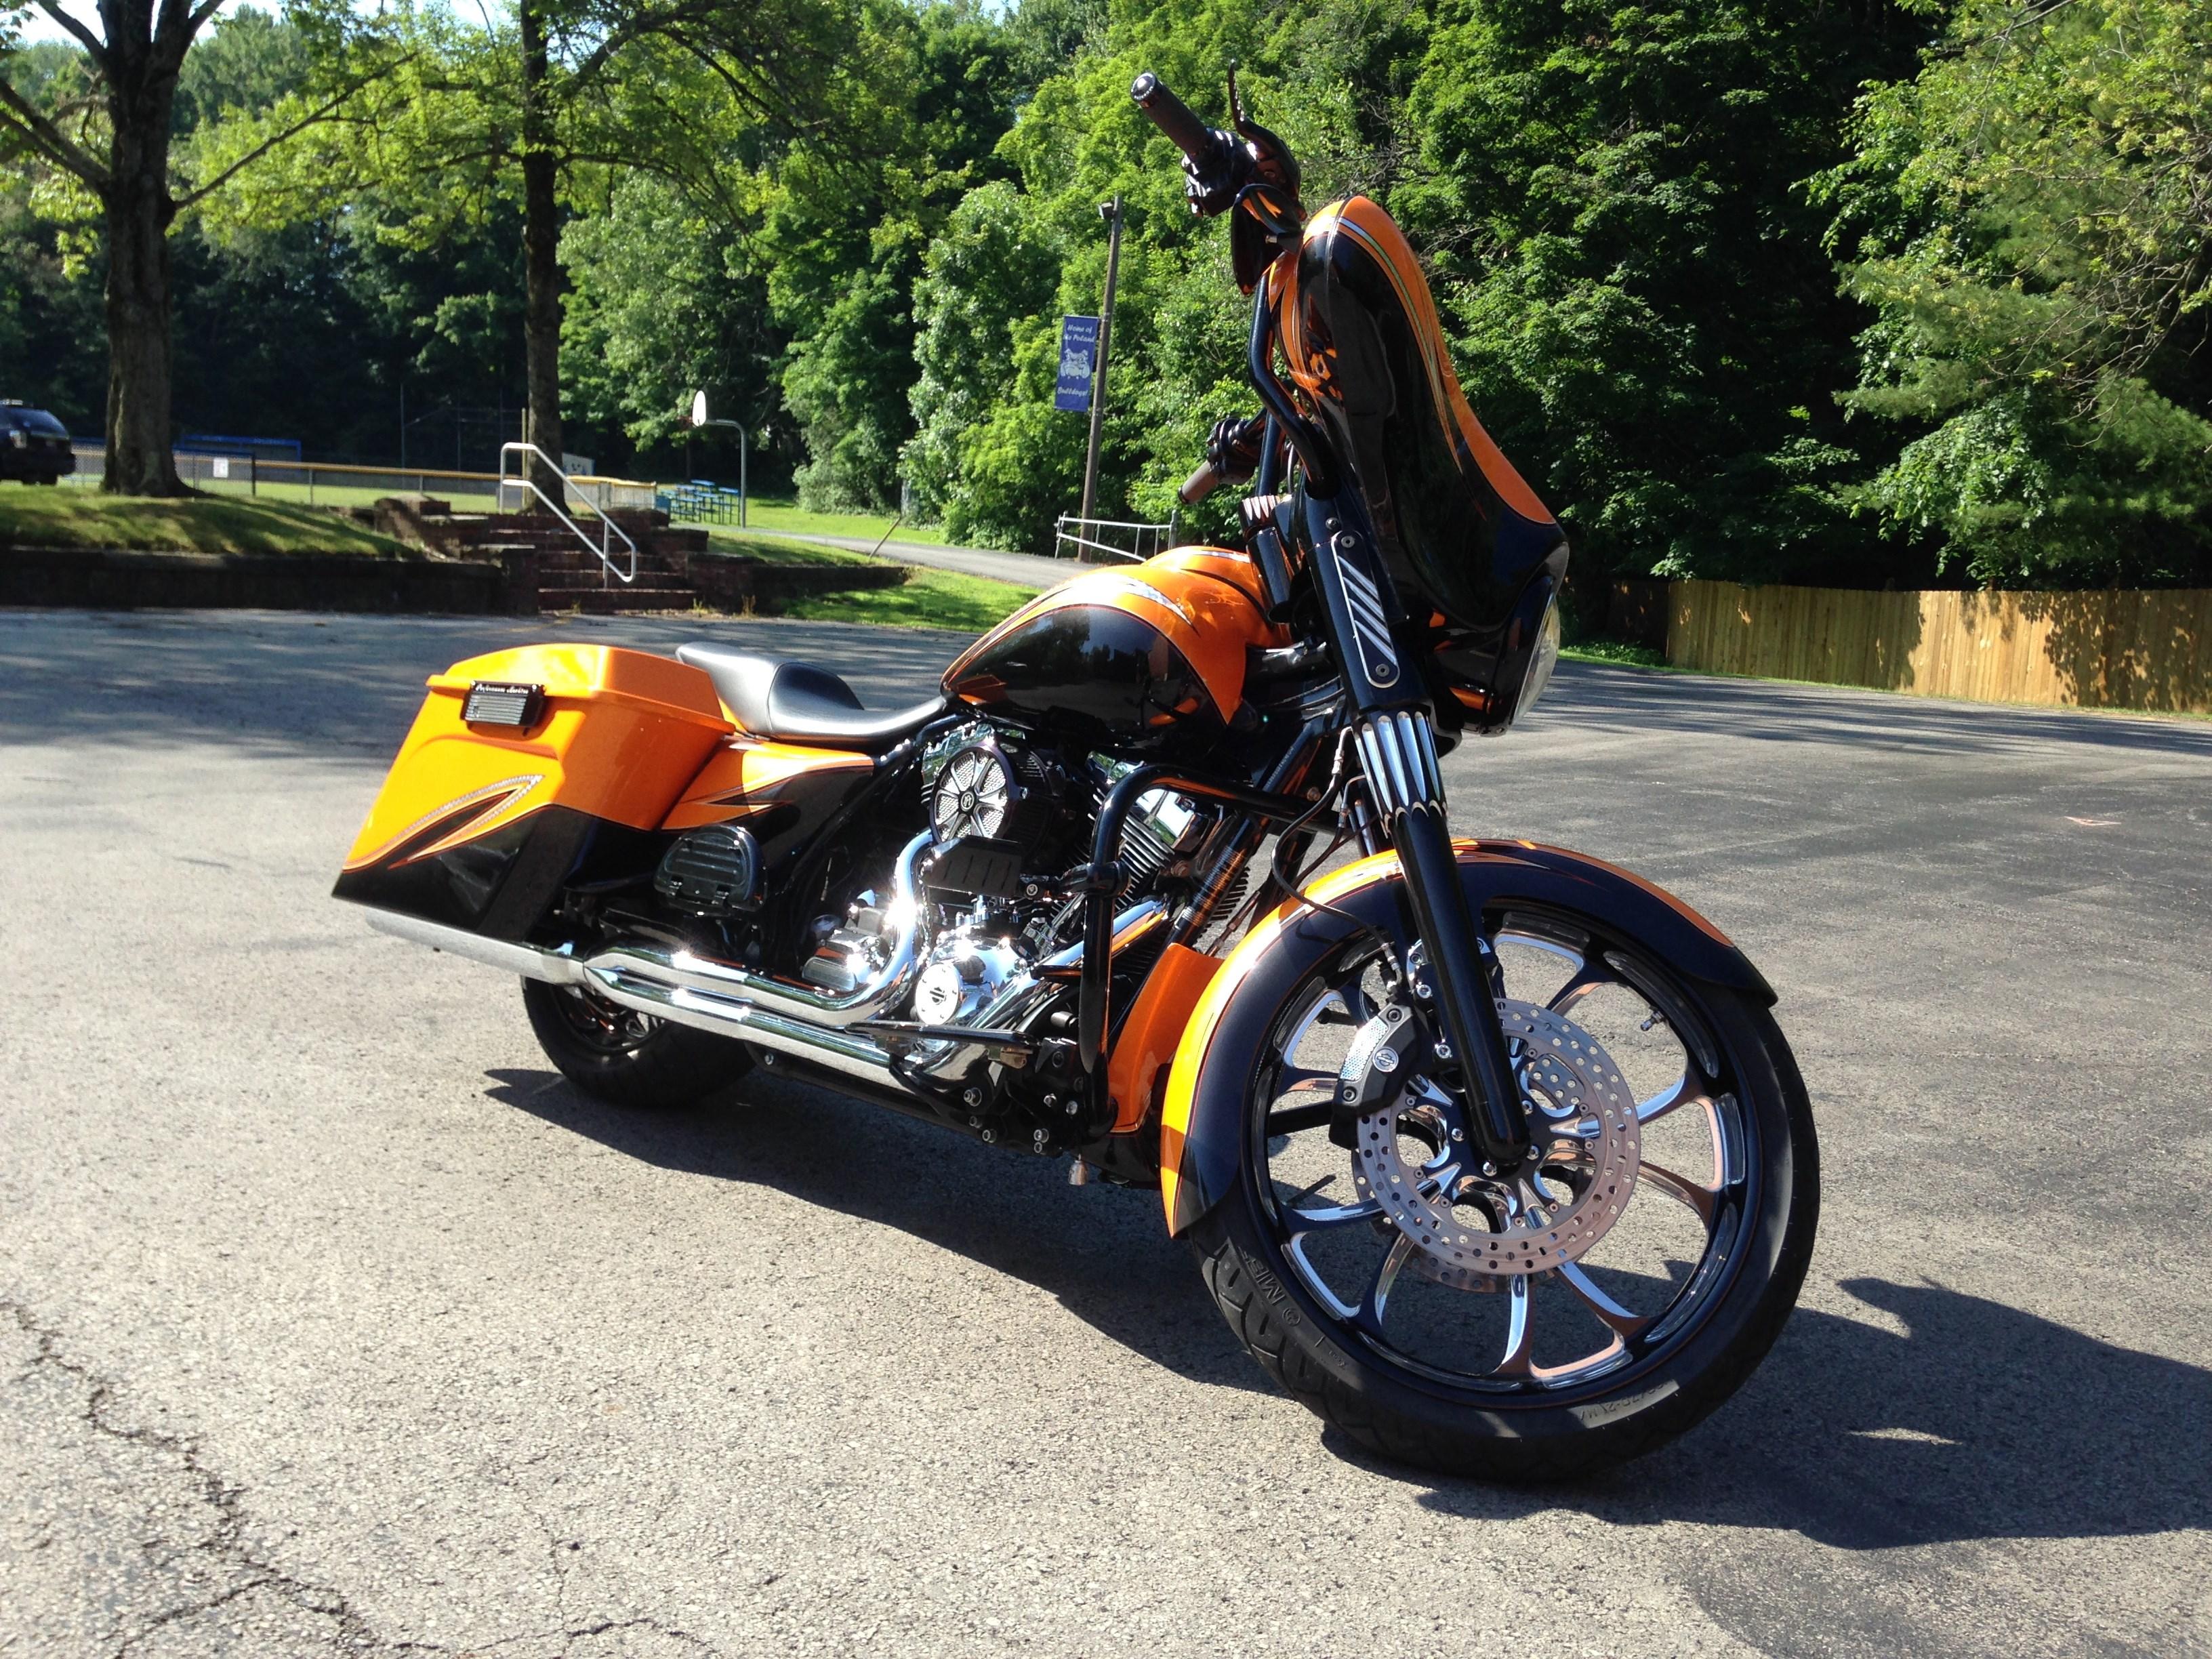 2011 harley davidson flhx street glide orange and black youngstown ohio 562376. Black Bedroom Furniture Sets. Home Design Ideas